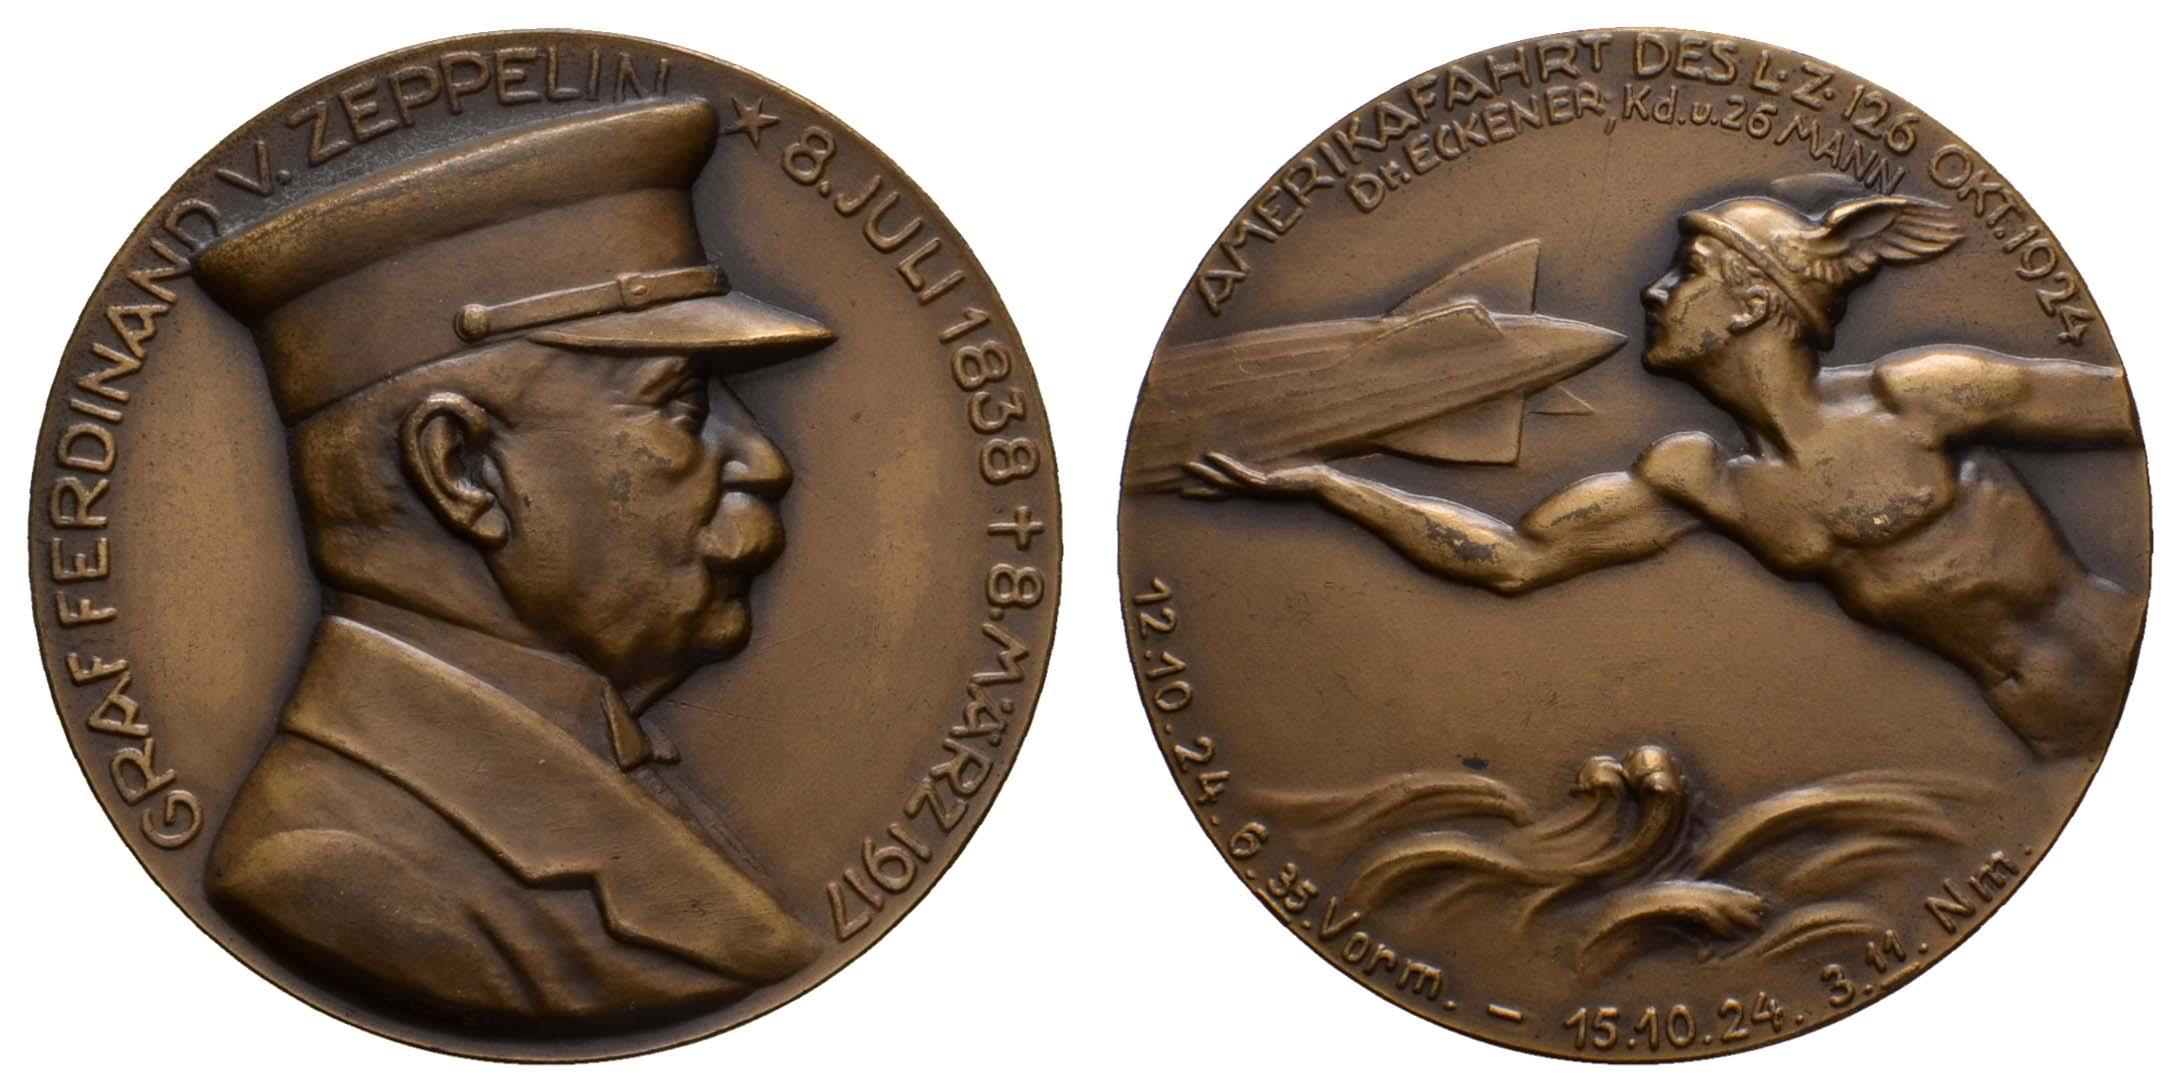 Lot 2335 - medaillen Sonstige Medaillen - Zeppelin -  Auktionshaus Ulrich Felzmann GmbH & Co. KG Coins single lots